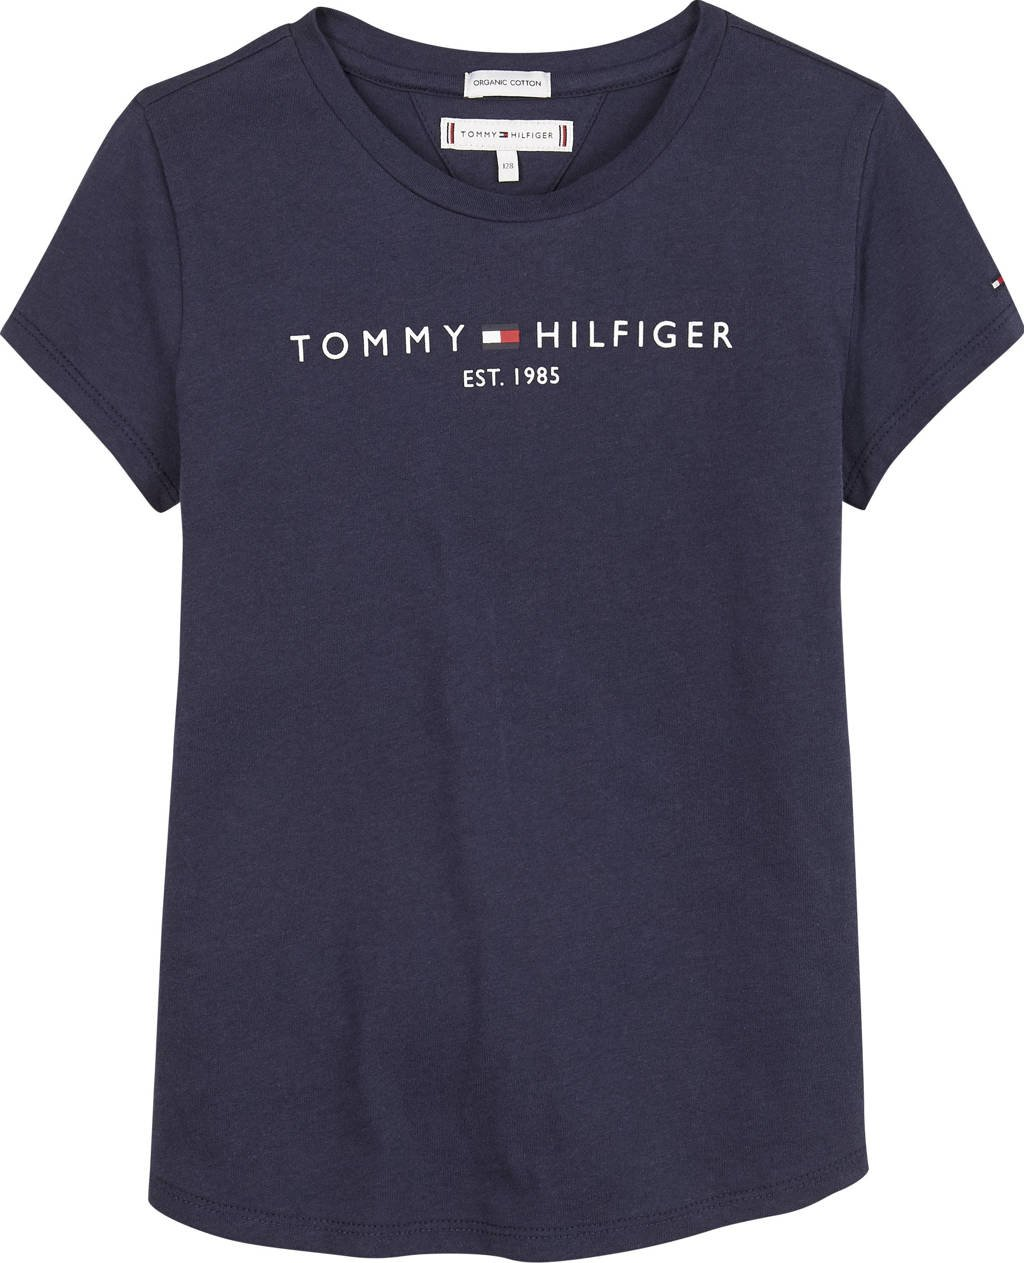 Tommy Hilfiger T-shirt van biologisch katoen donkerblauw, Donkerblauw